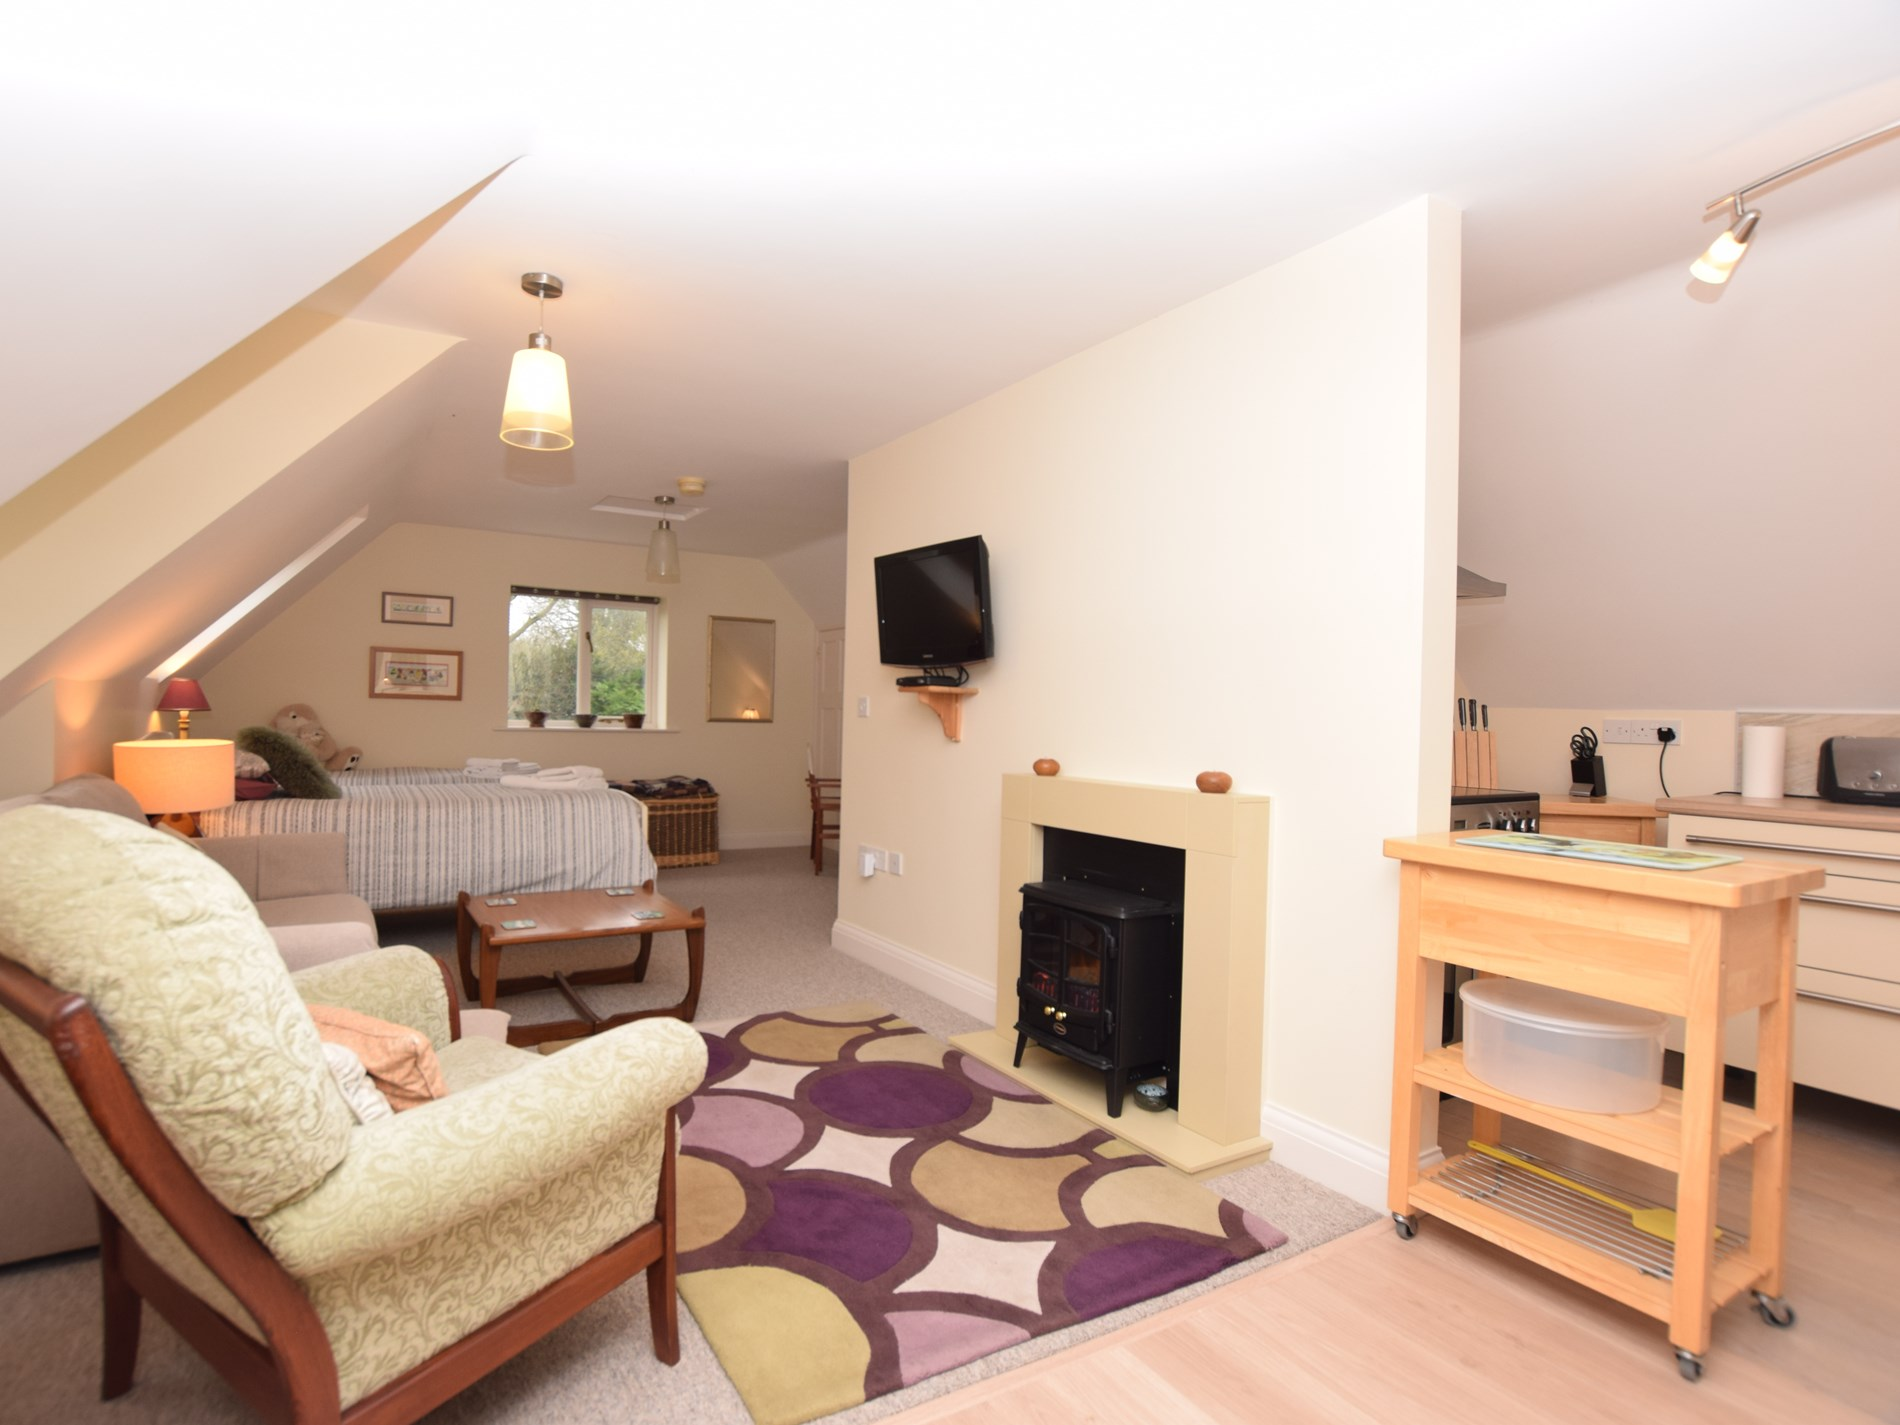 1 Bedroom Cottage in Fakenham, East Anglia